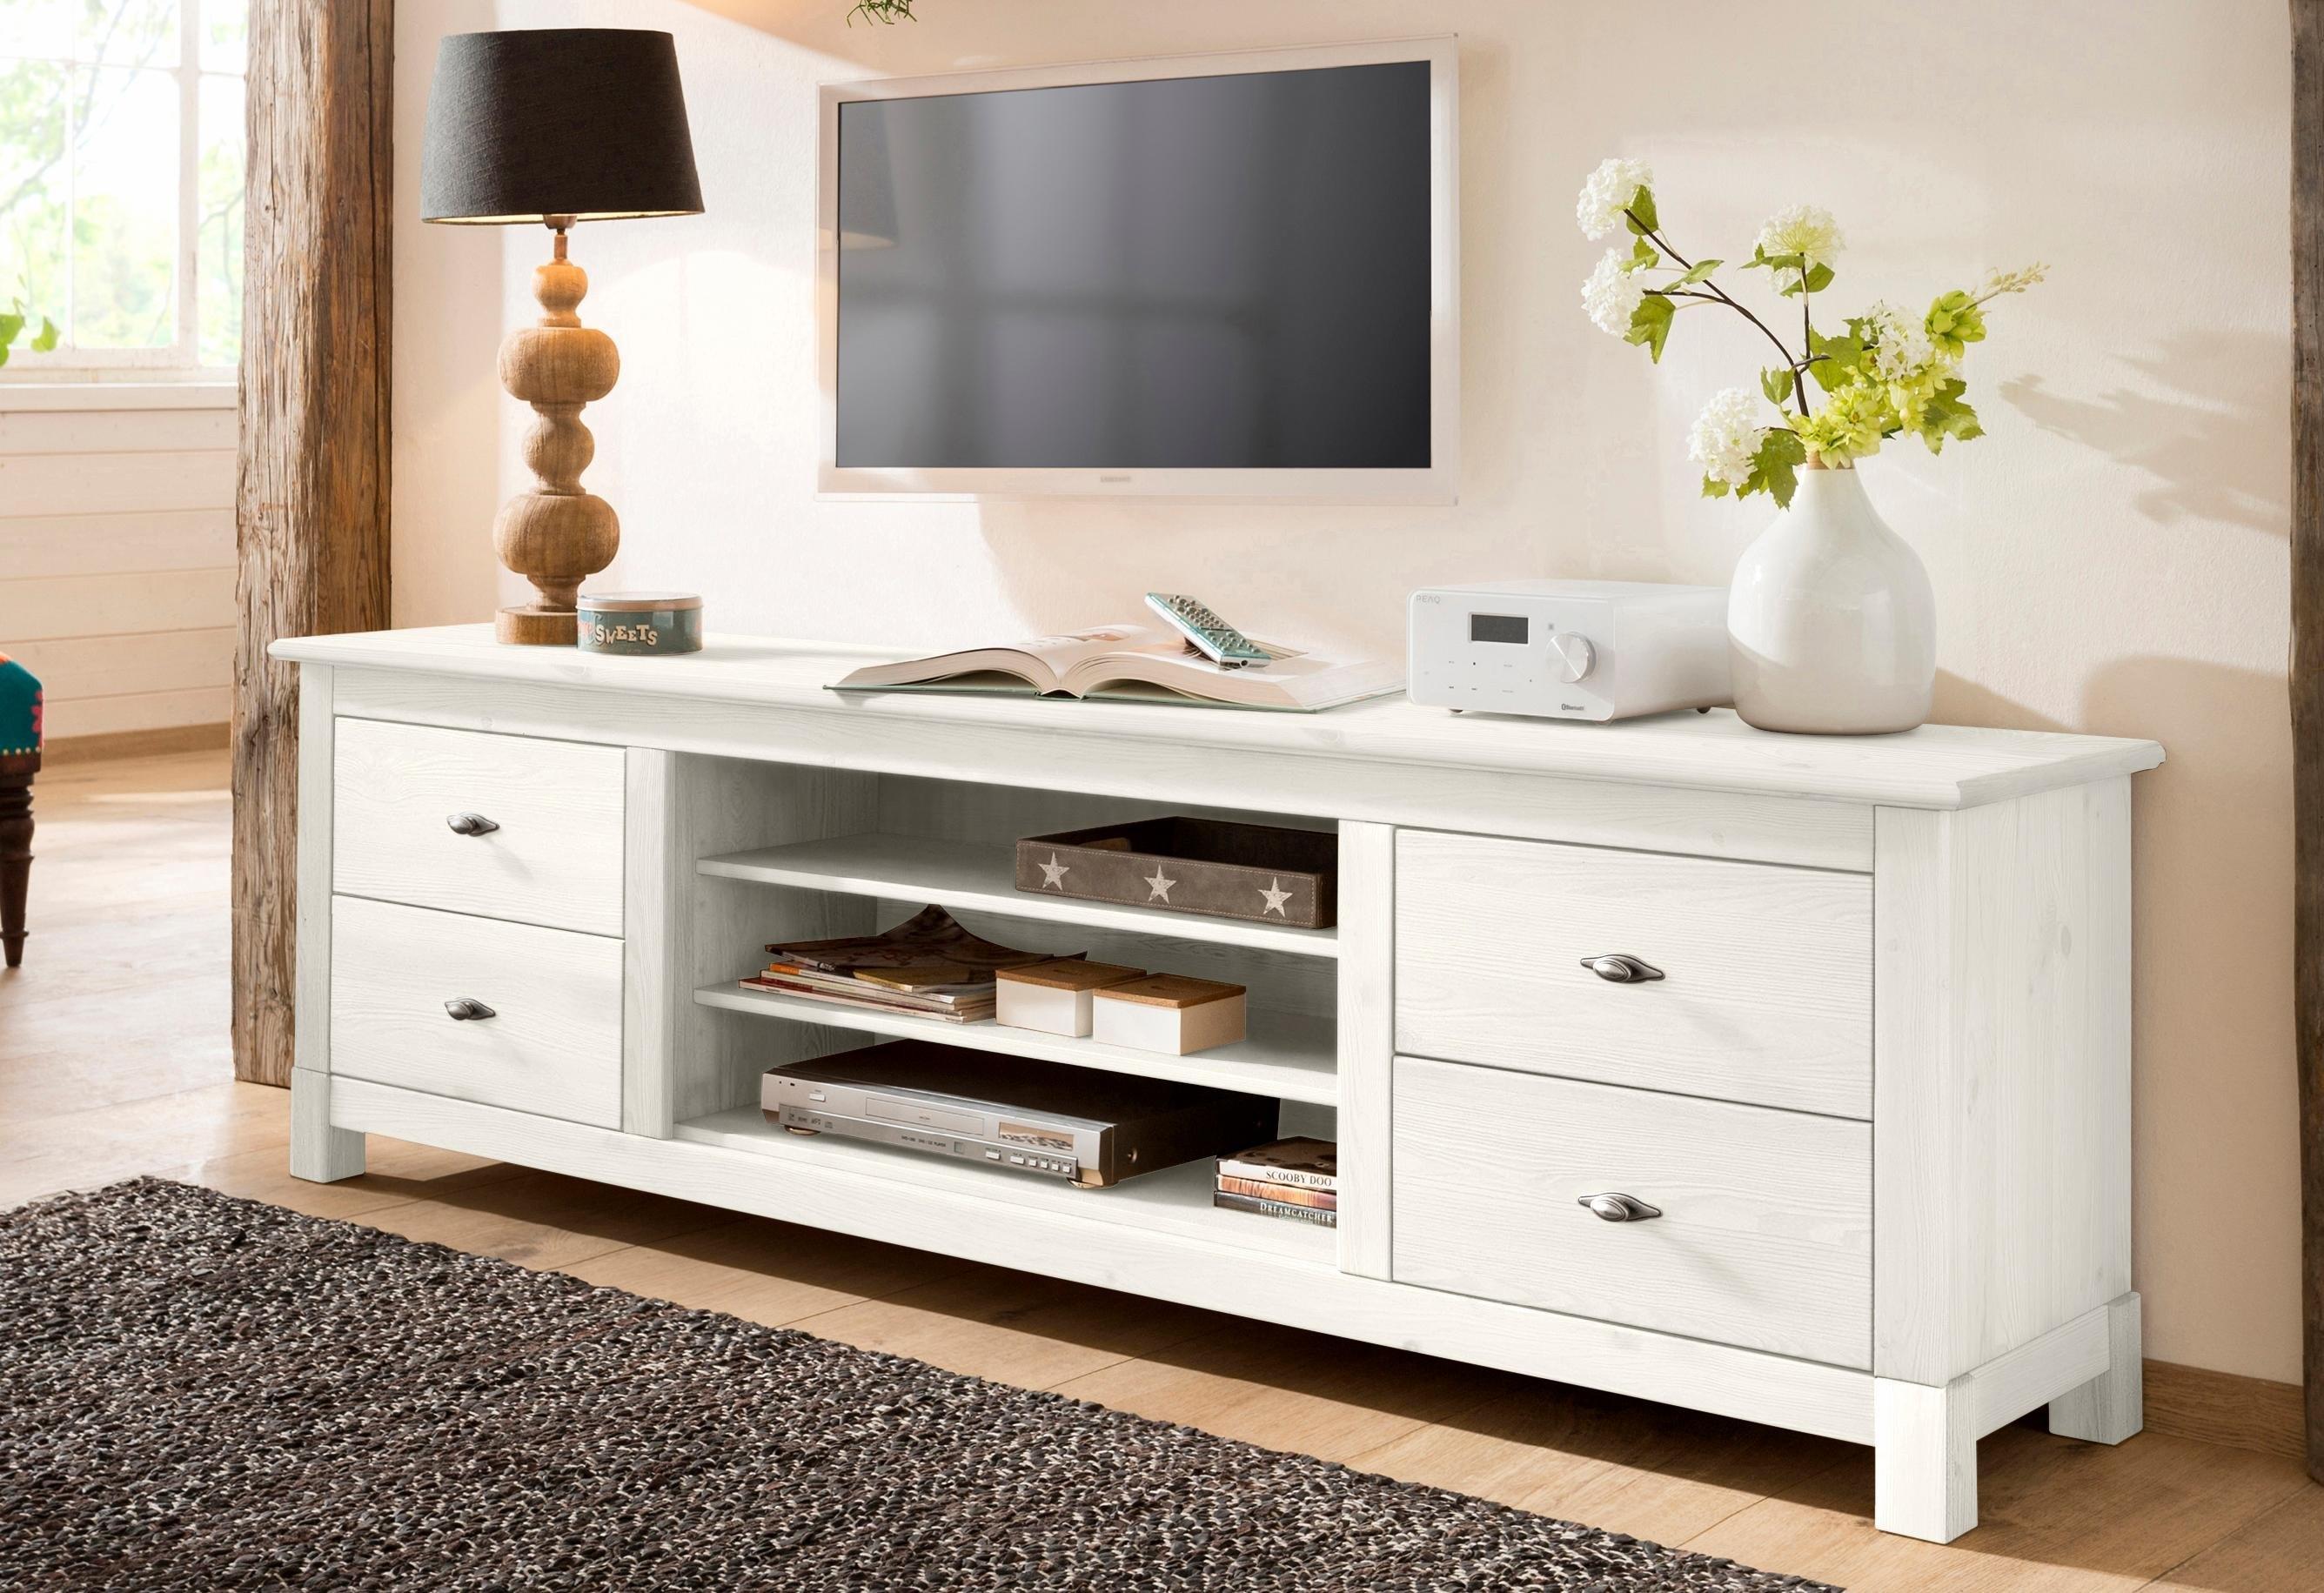 Home affaire tv-meubel »Rauna«, breedte 200 cm nu online bestellen